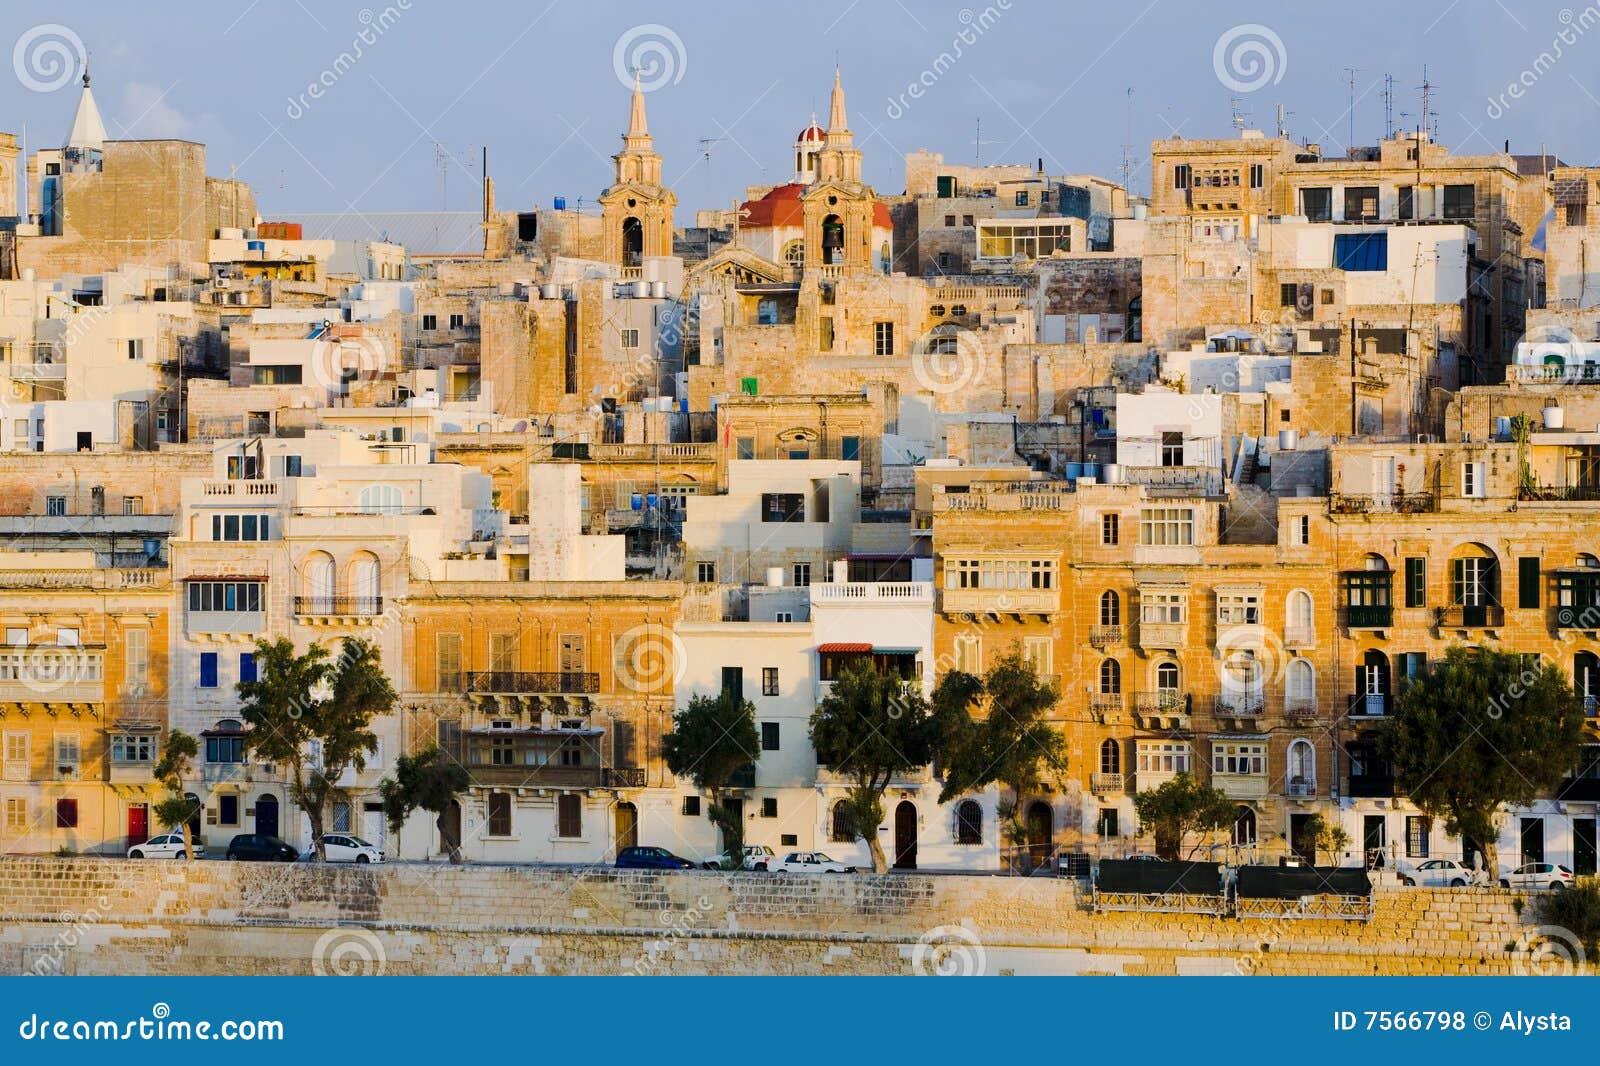 Bord de mer de Malte valletta de constructions